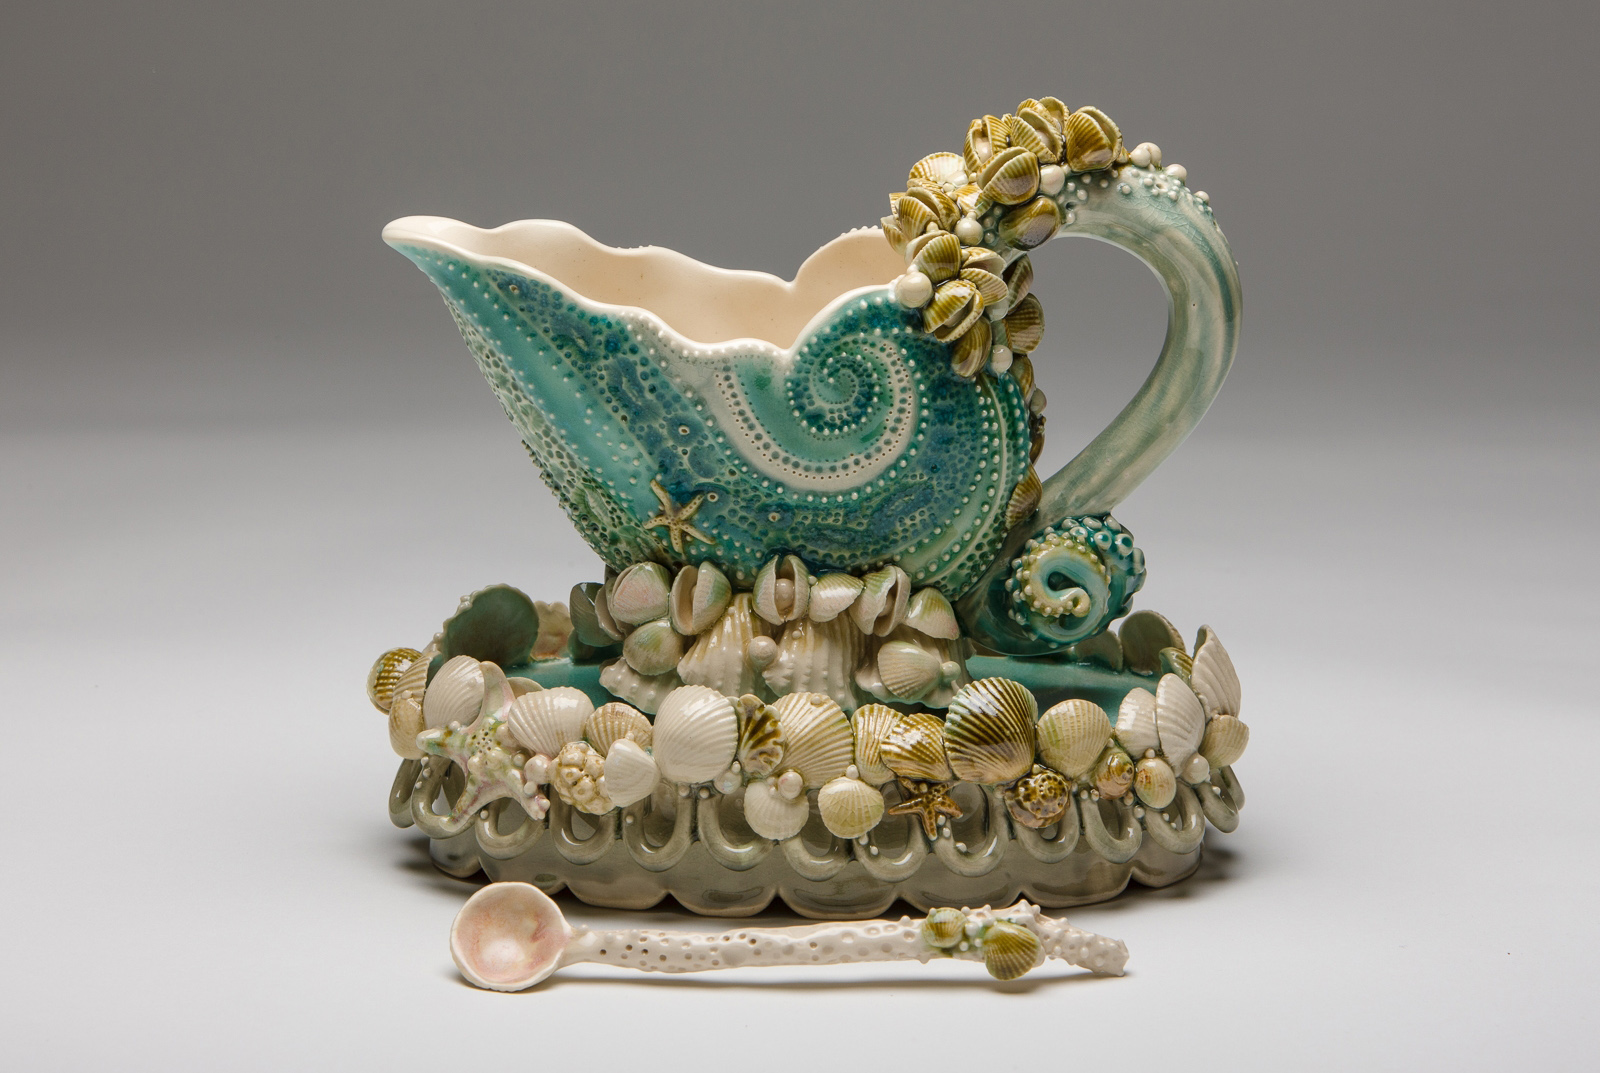 Claire Prenton S Ornamental Clay Creations Balance Form